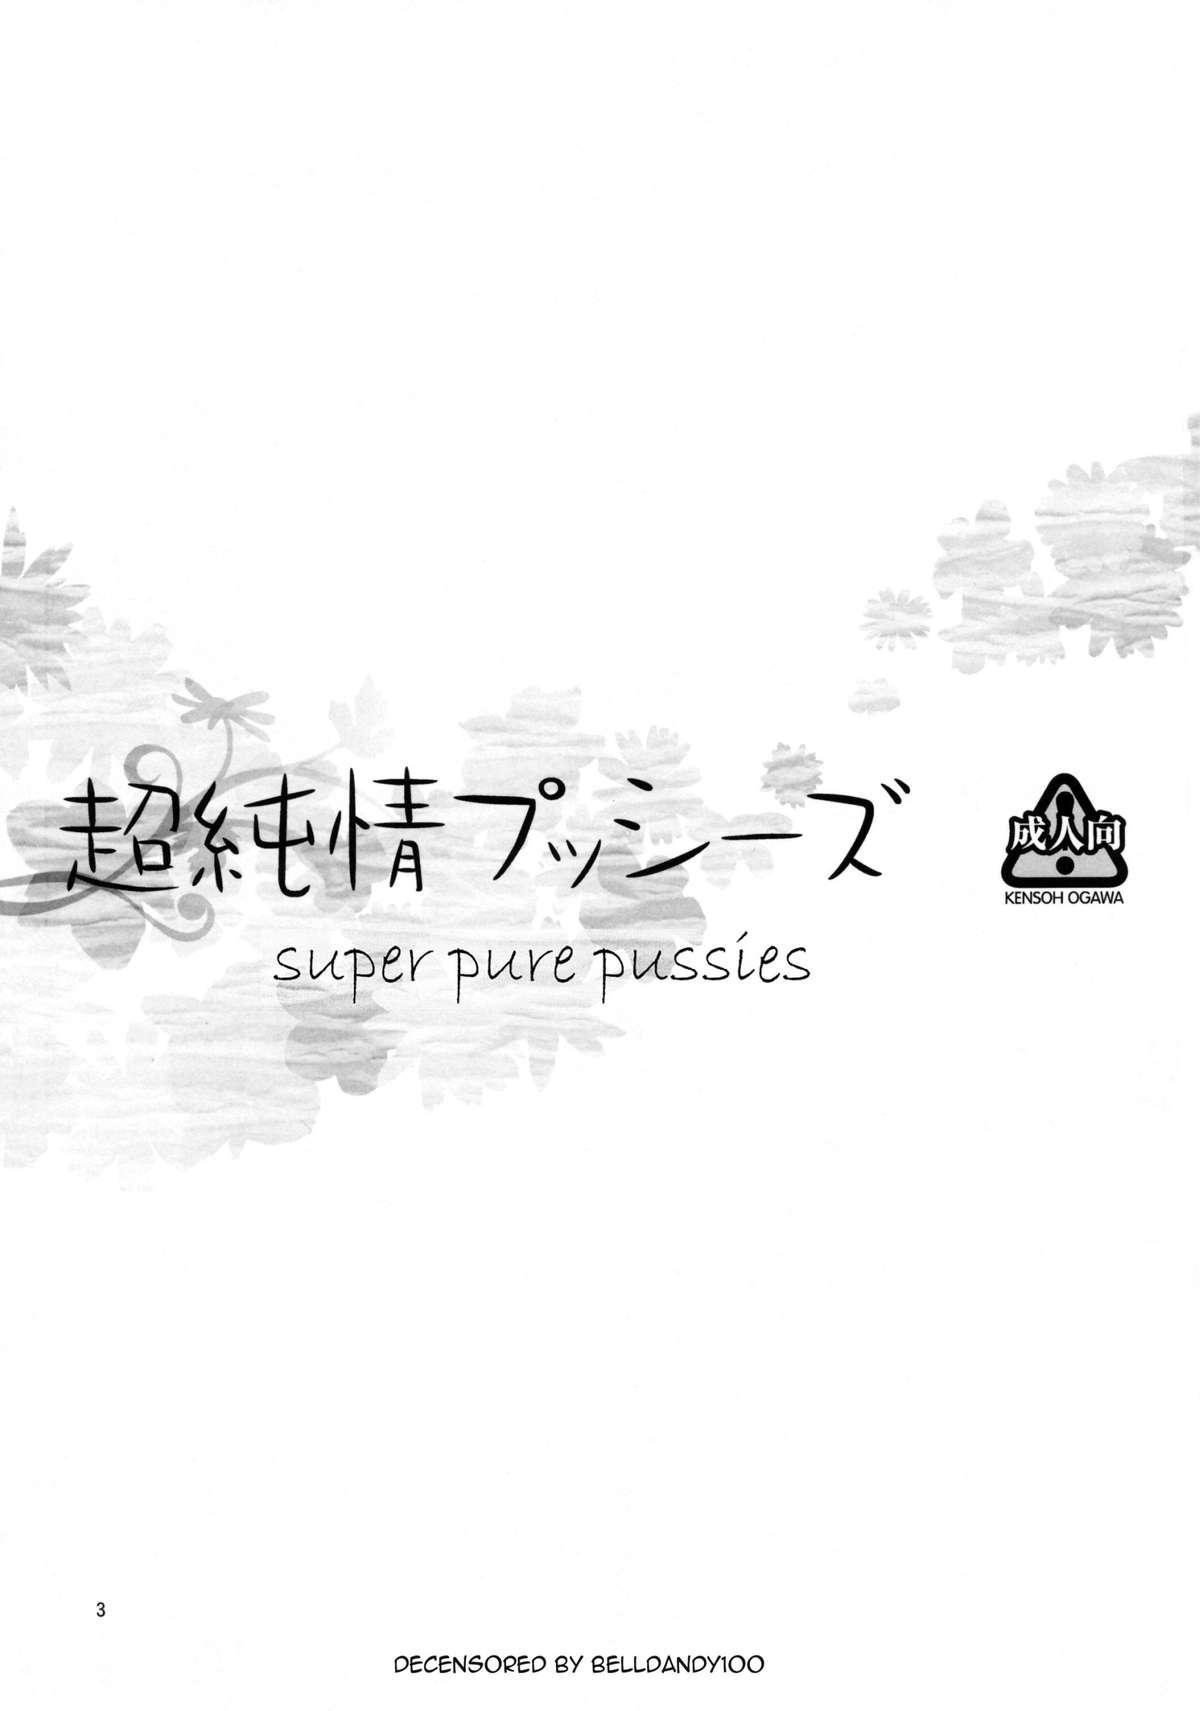 Chou Junjou Pussies | Super Pure Pussies 1